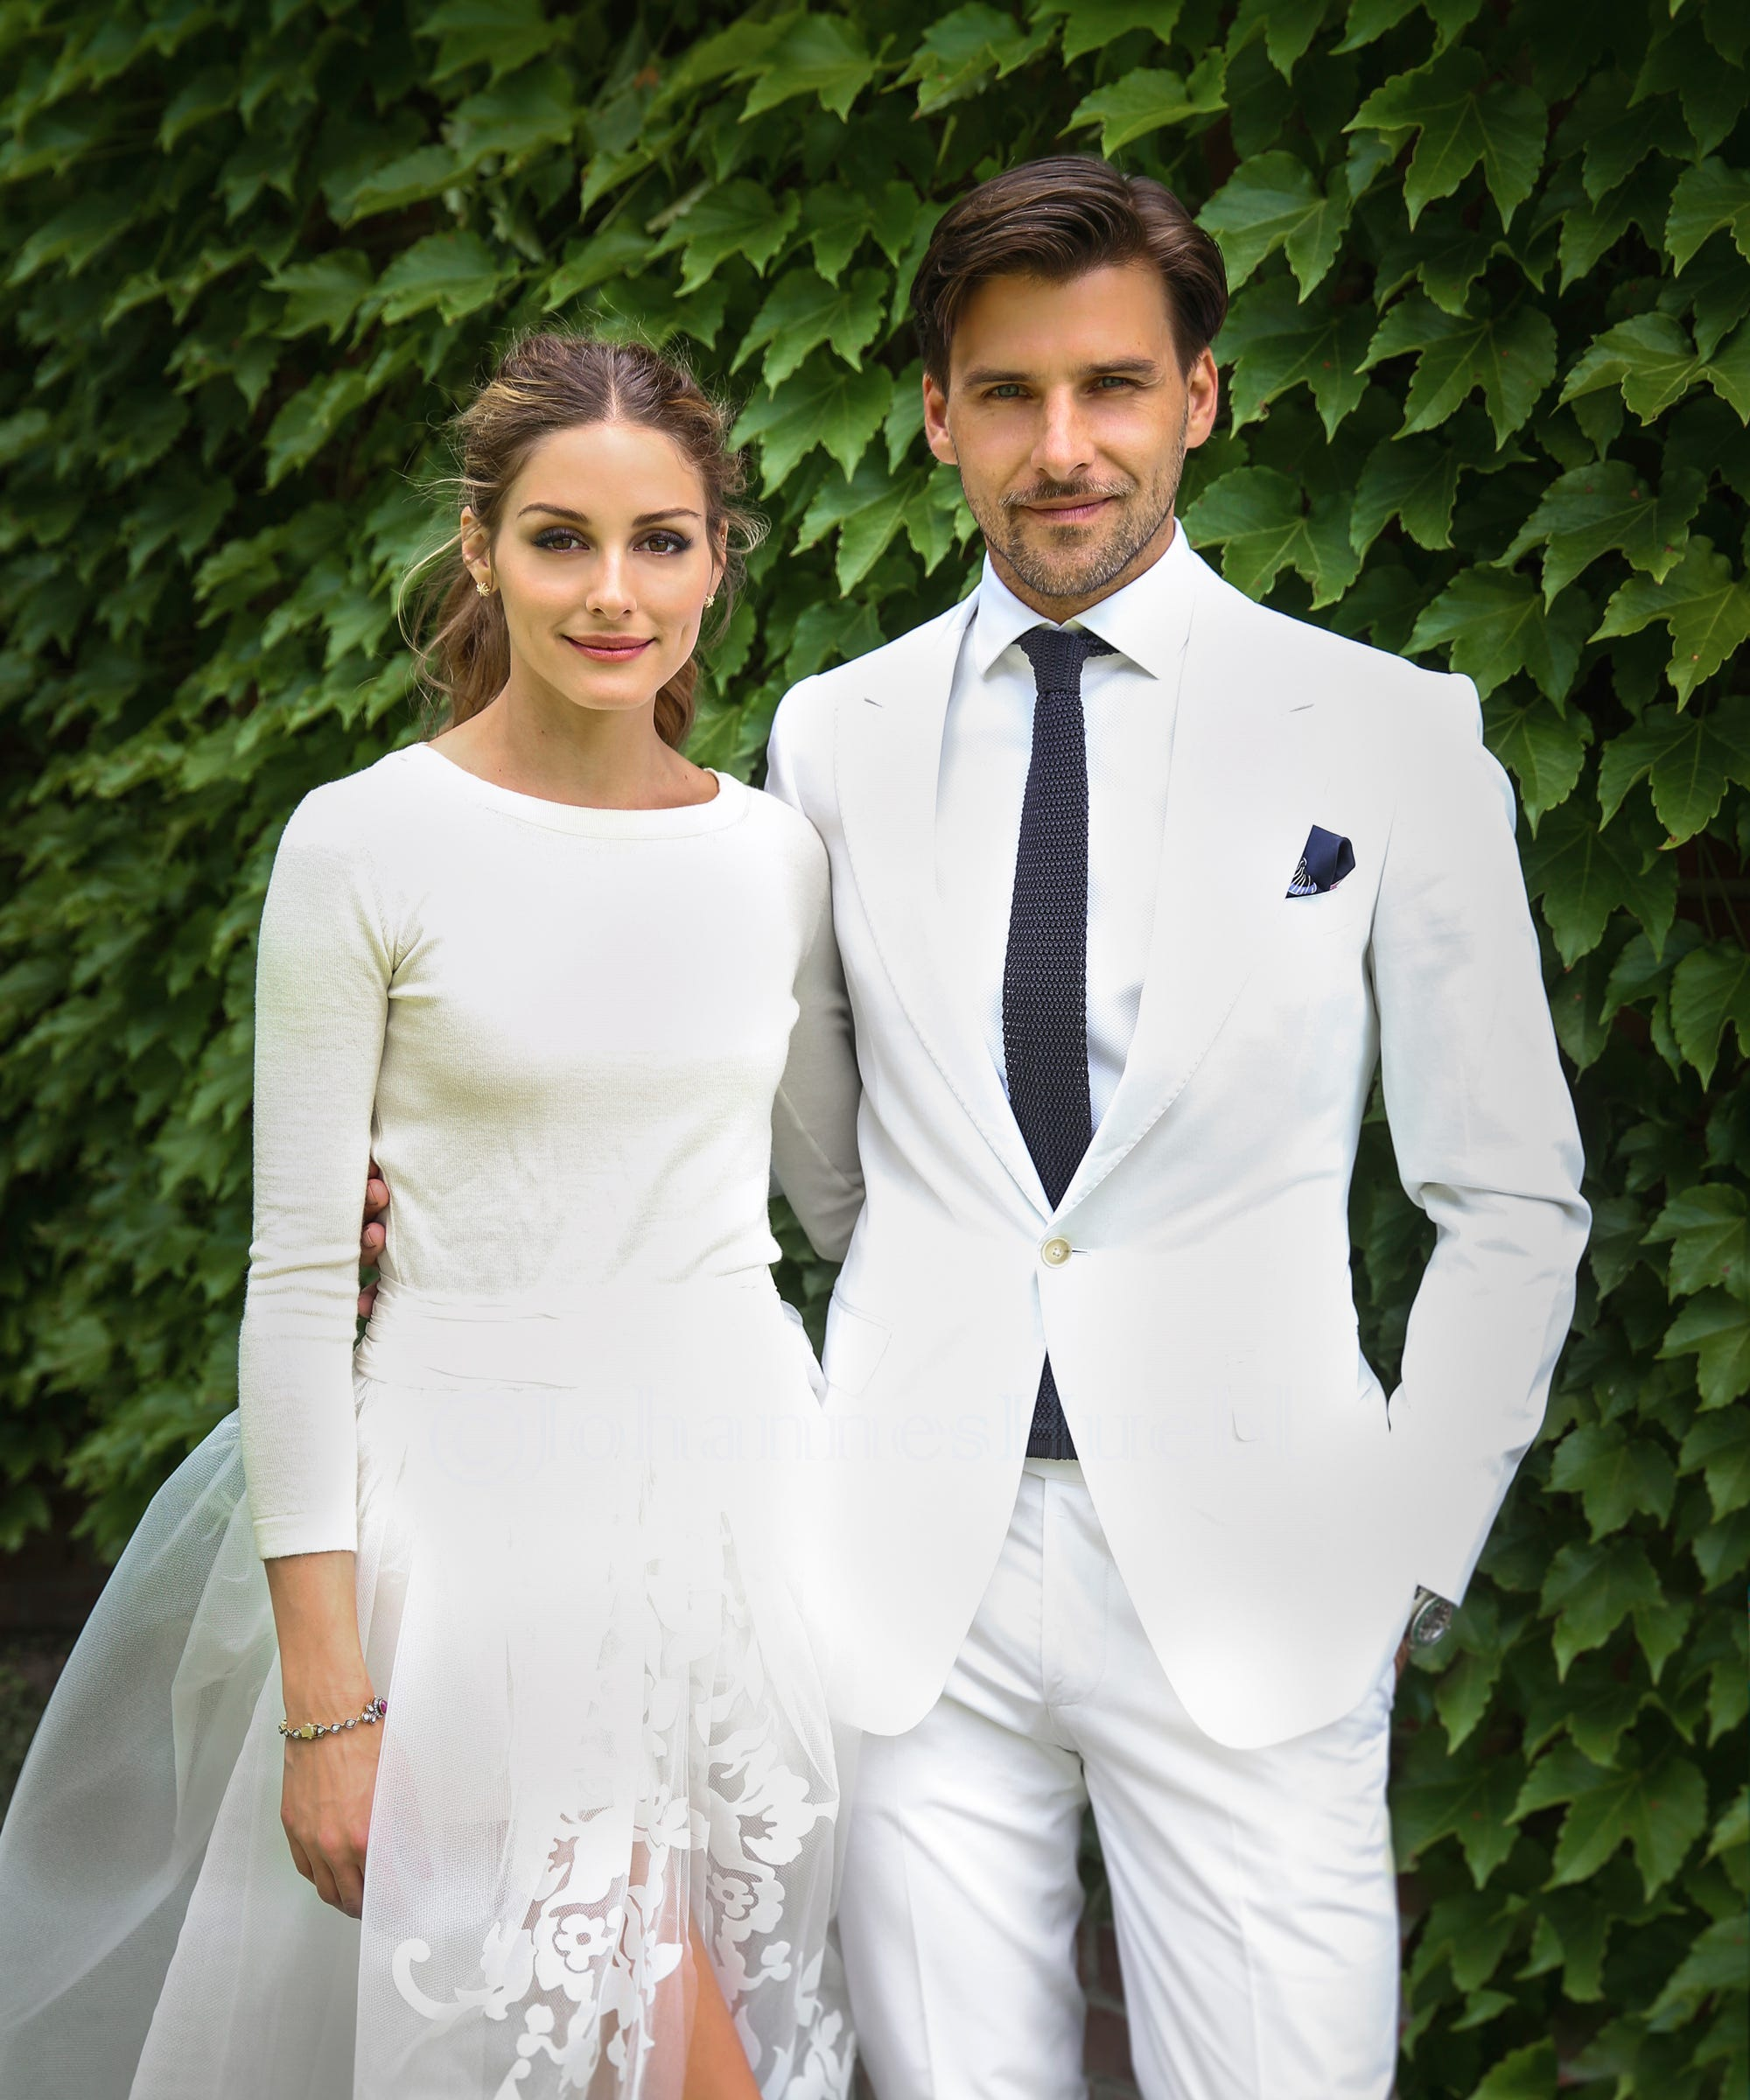 Kristen Bell Wedding Photos Celebrity Dresses